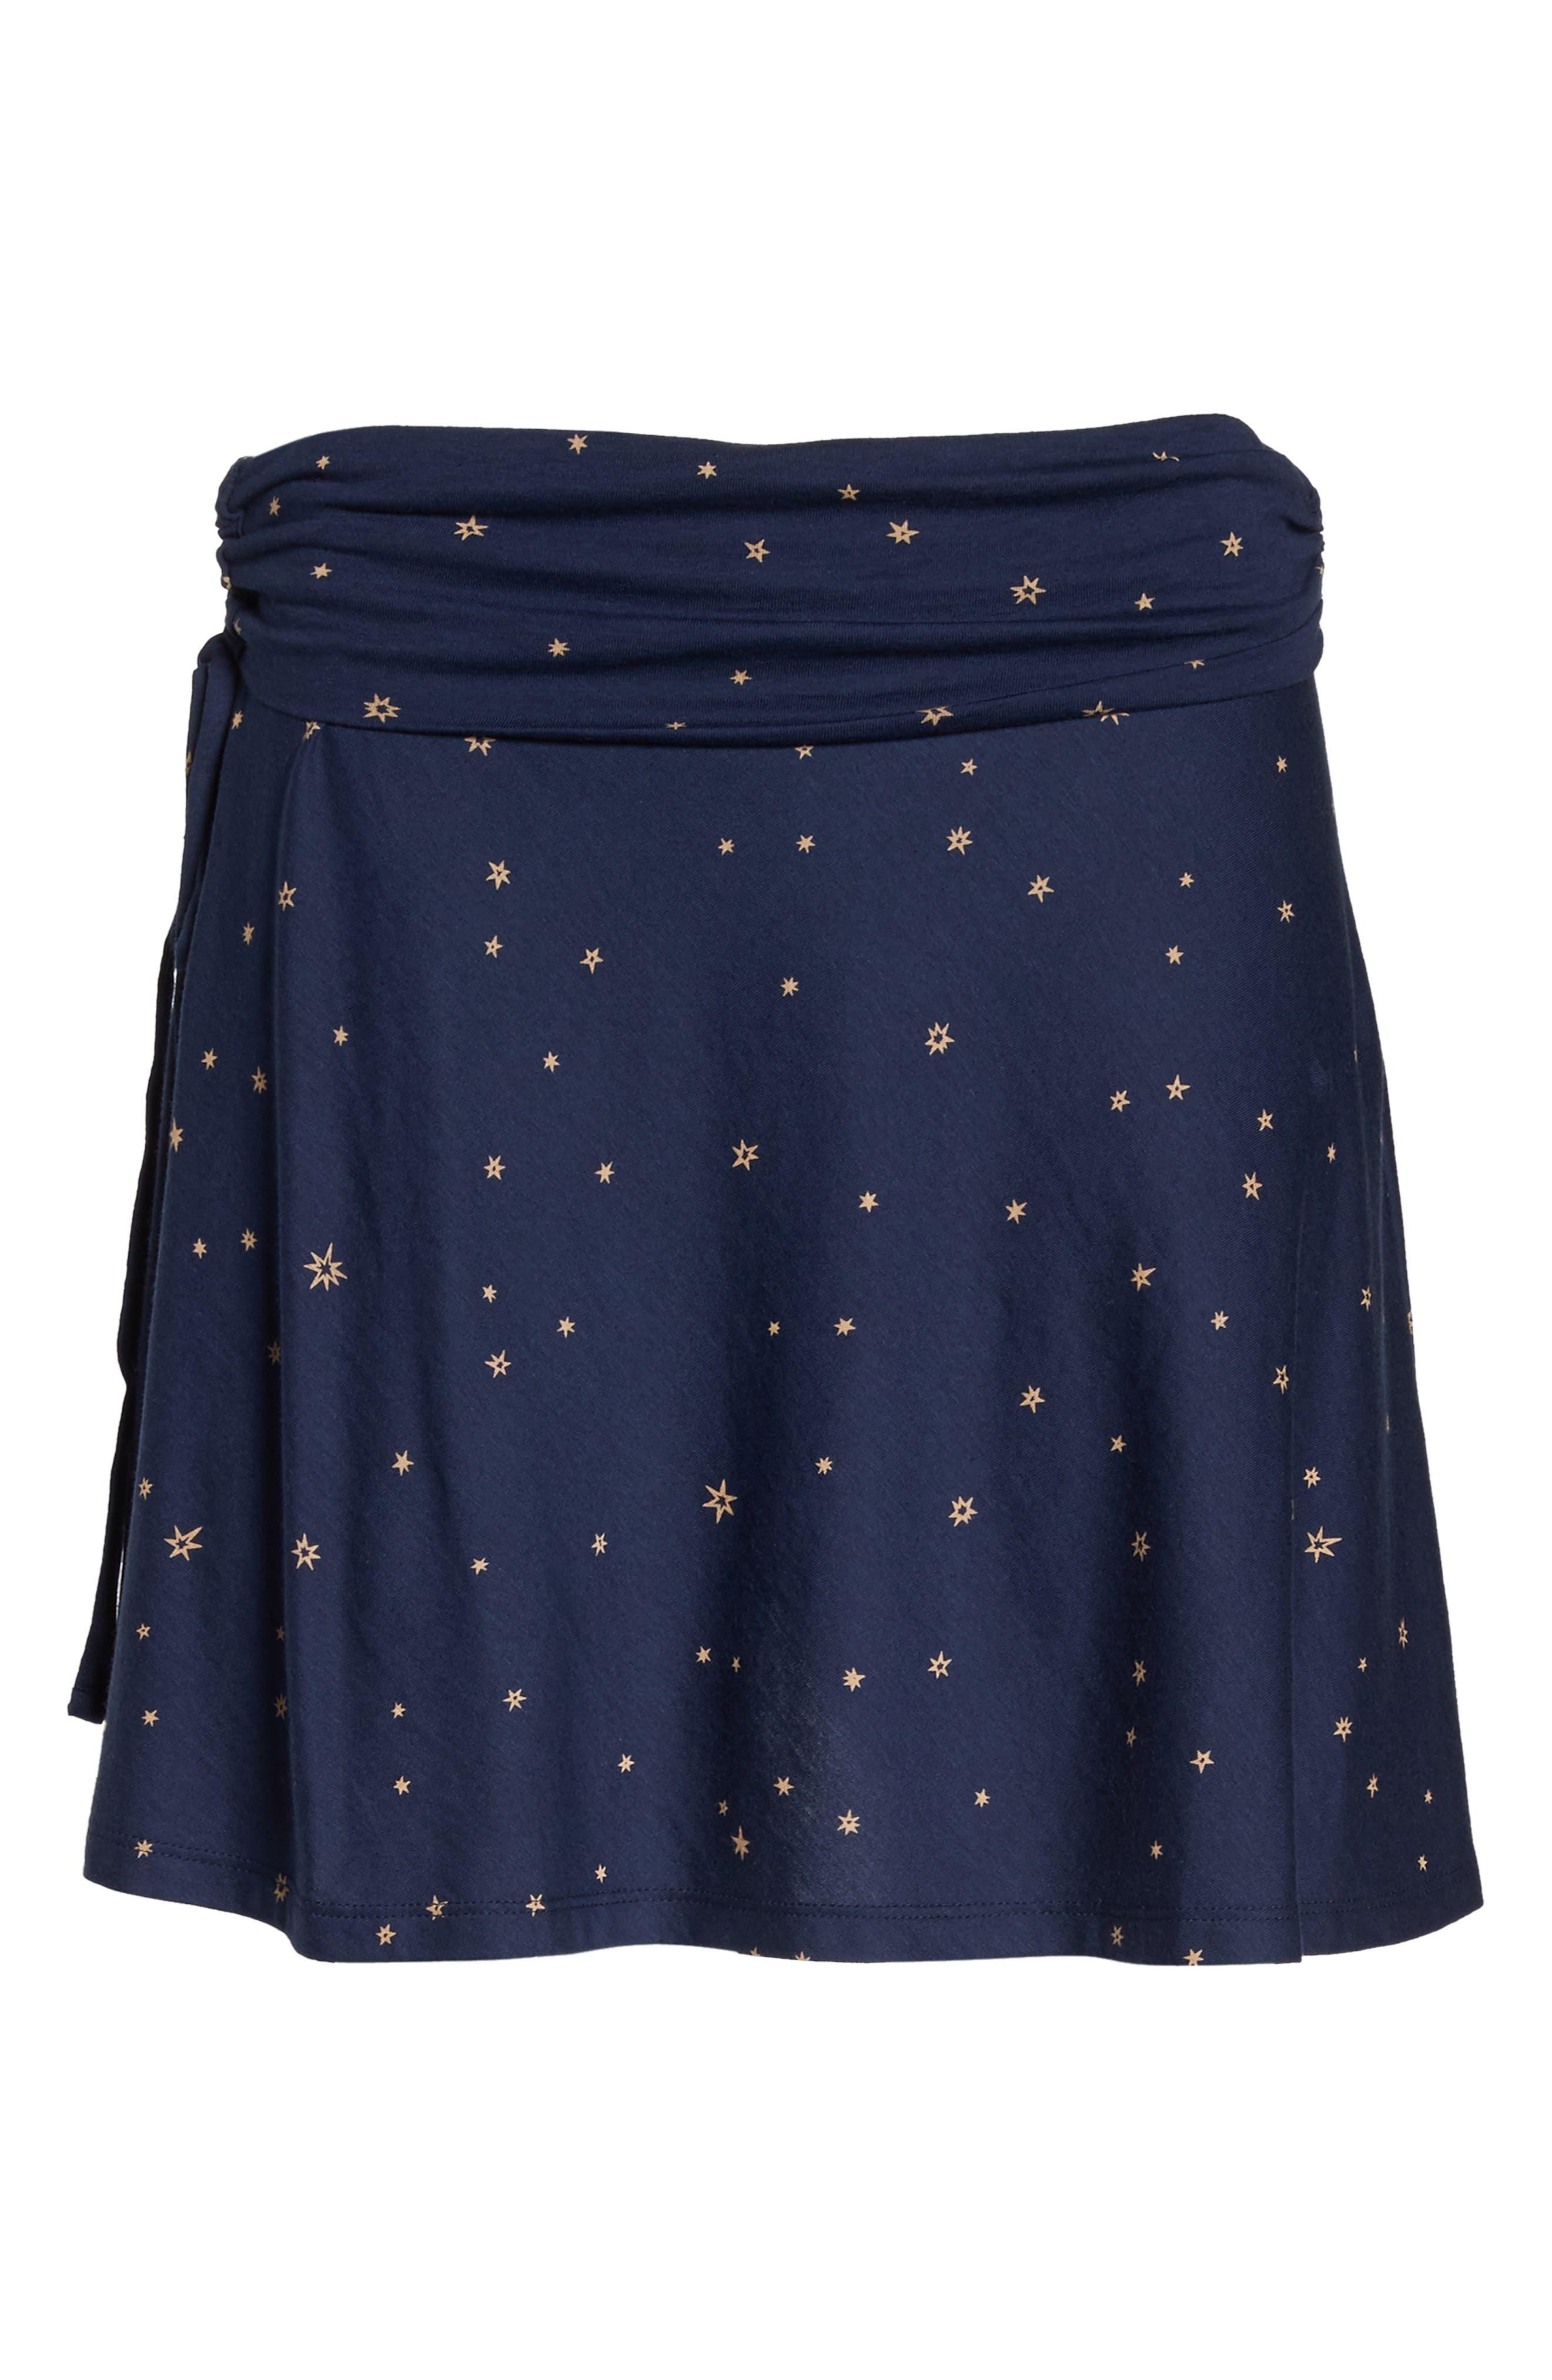 Lithia Cotton Blend Skirt,                             Alternate thumbnail 7, color,                             Micr Mica Pop Classic Navy